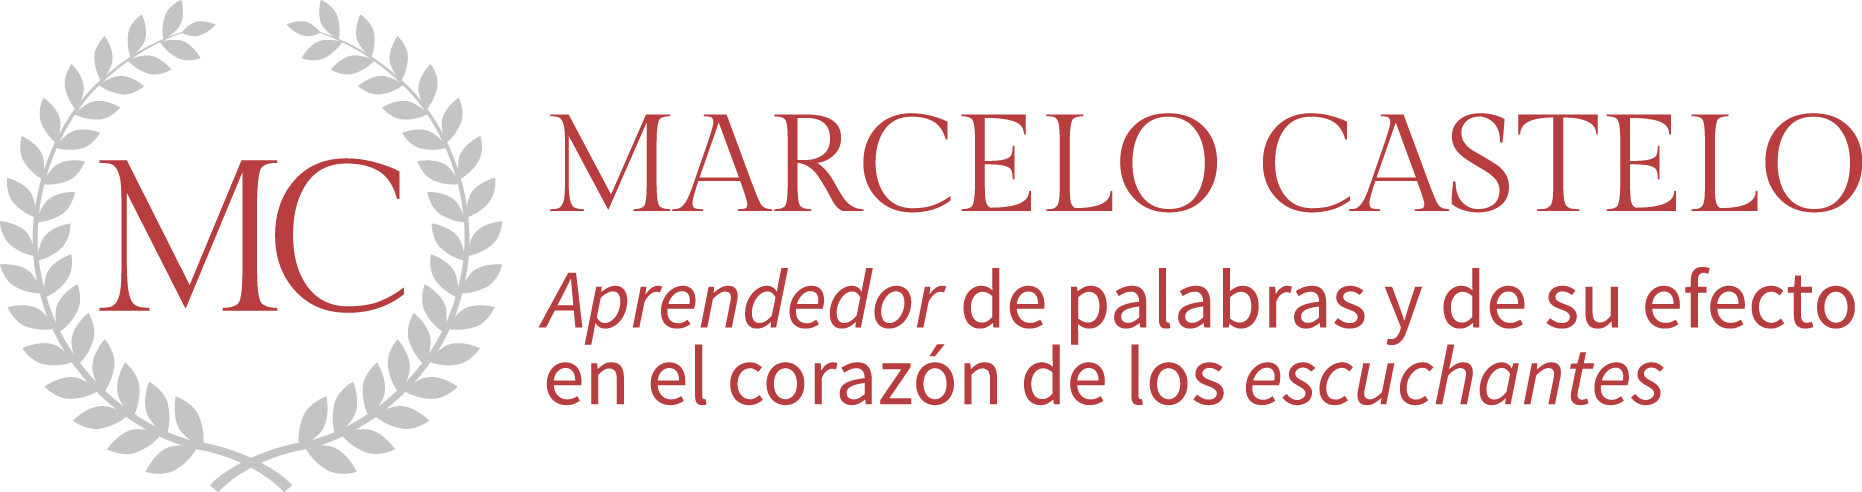 Marcelo Castelo